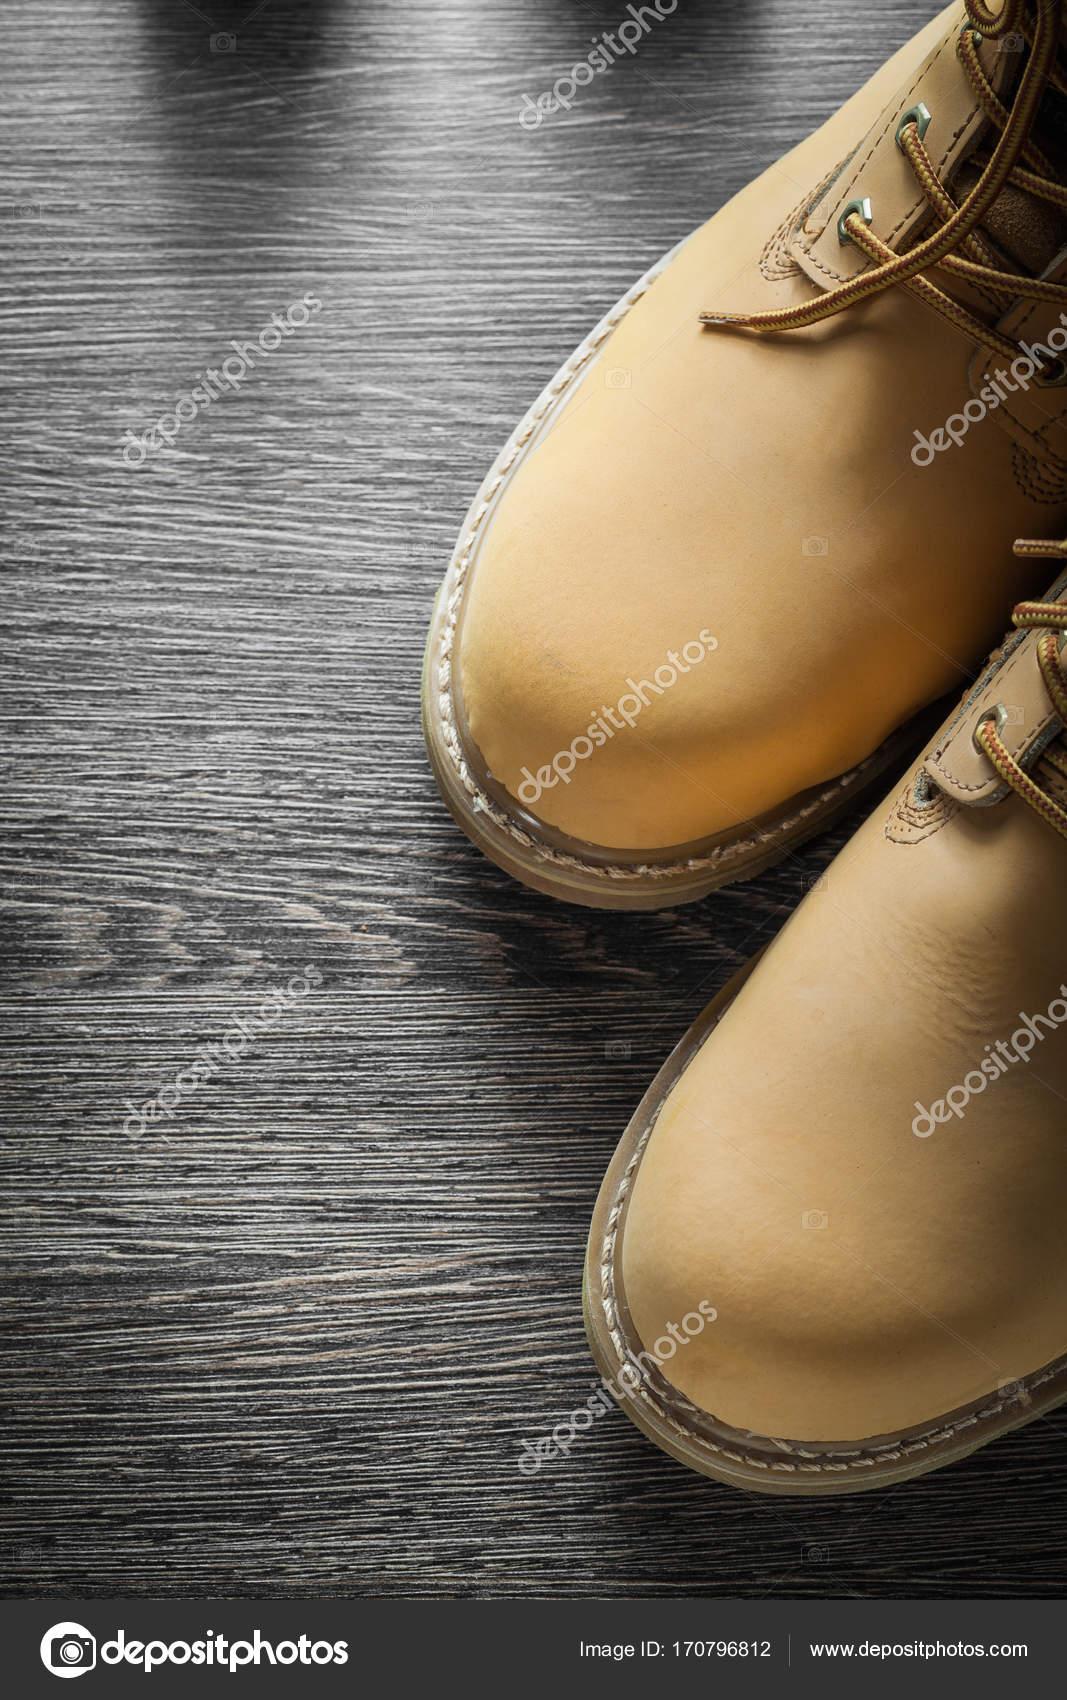 90d2c1ad3db Ζευγάρι των αδιάβροχη ασφάλεια μπότες για ξύλινη σανίδα — Φωτογραφία ...